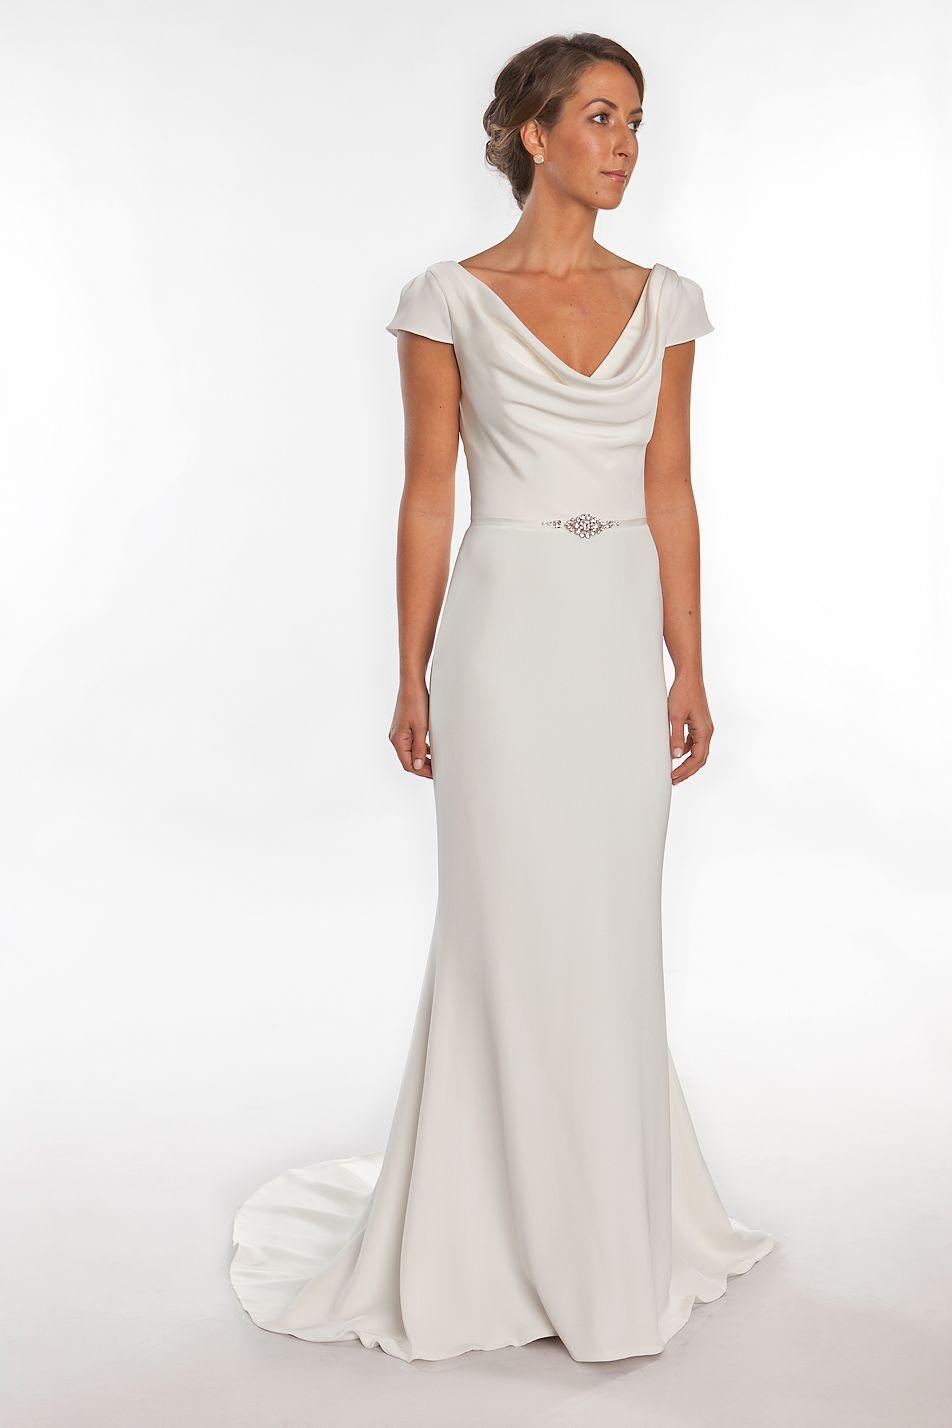 Charlotte cowl neck wedding dress with cap sleeves by for Satin cowl neck wedding dress